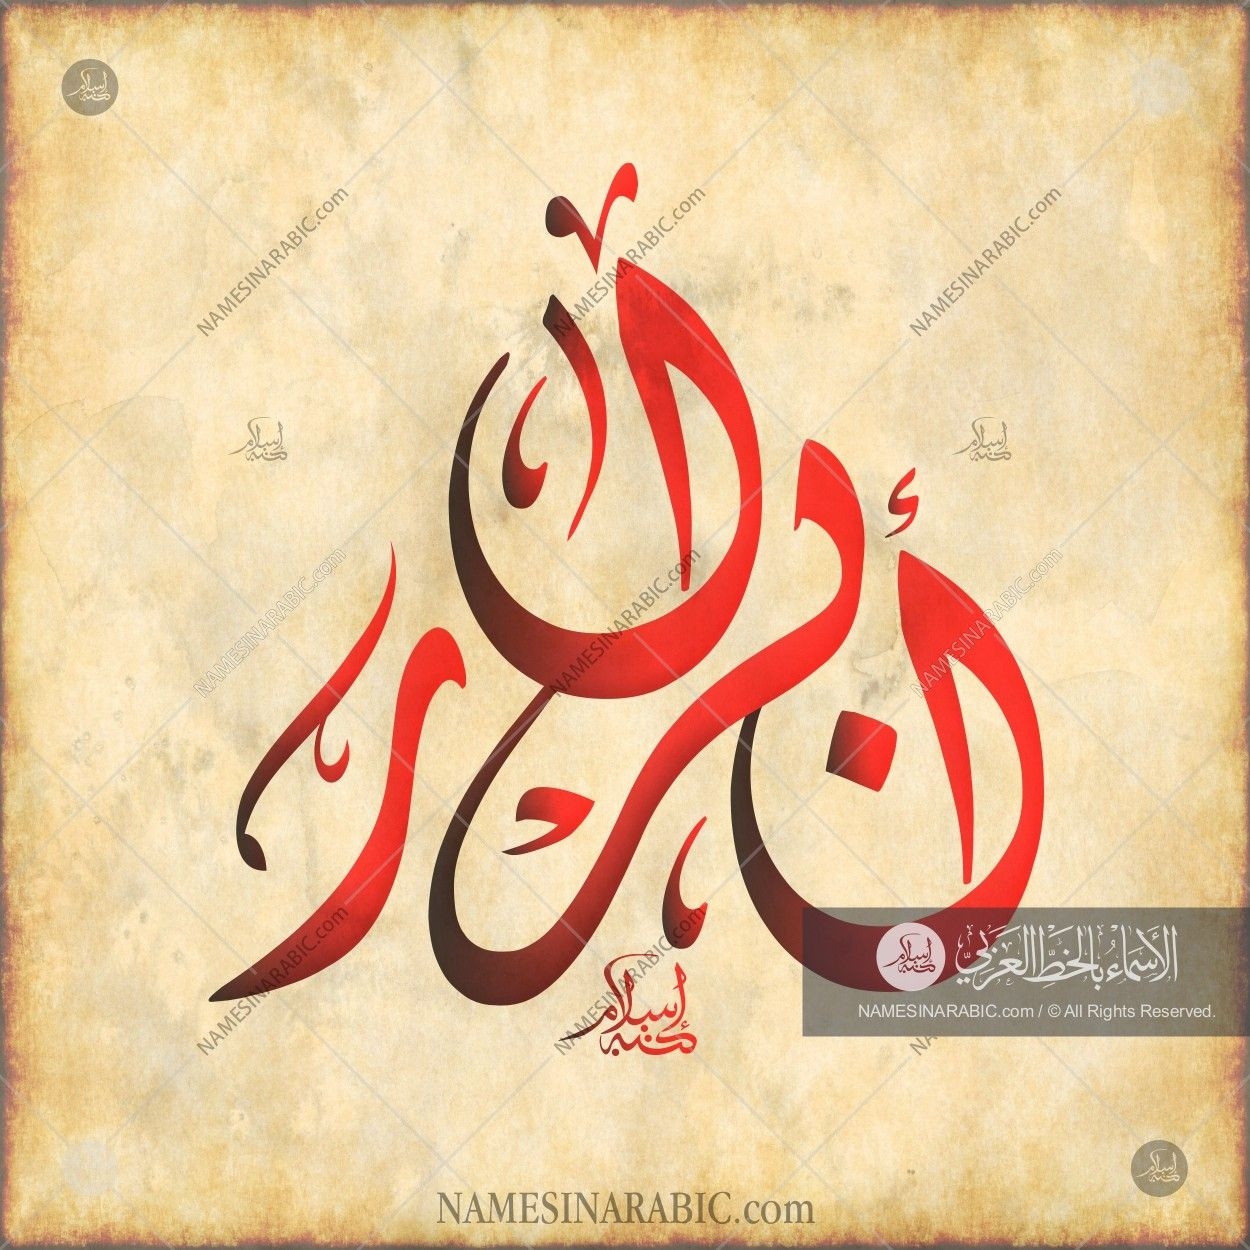 Abrar ابرار Names In Arabic Calligraphy Name 4805 Arabic Calligraphy Art Calligraphy Name Calligraphy